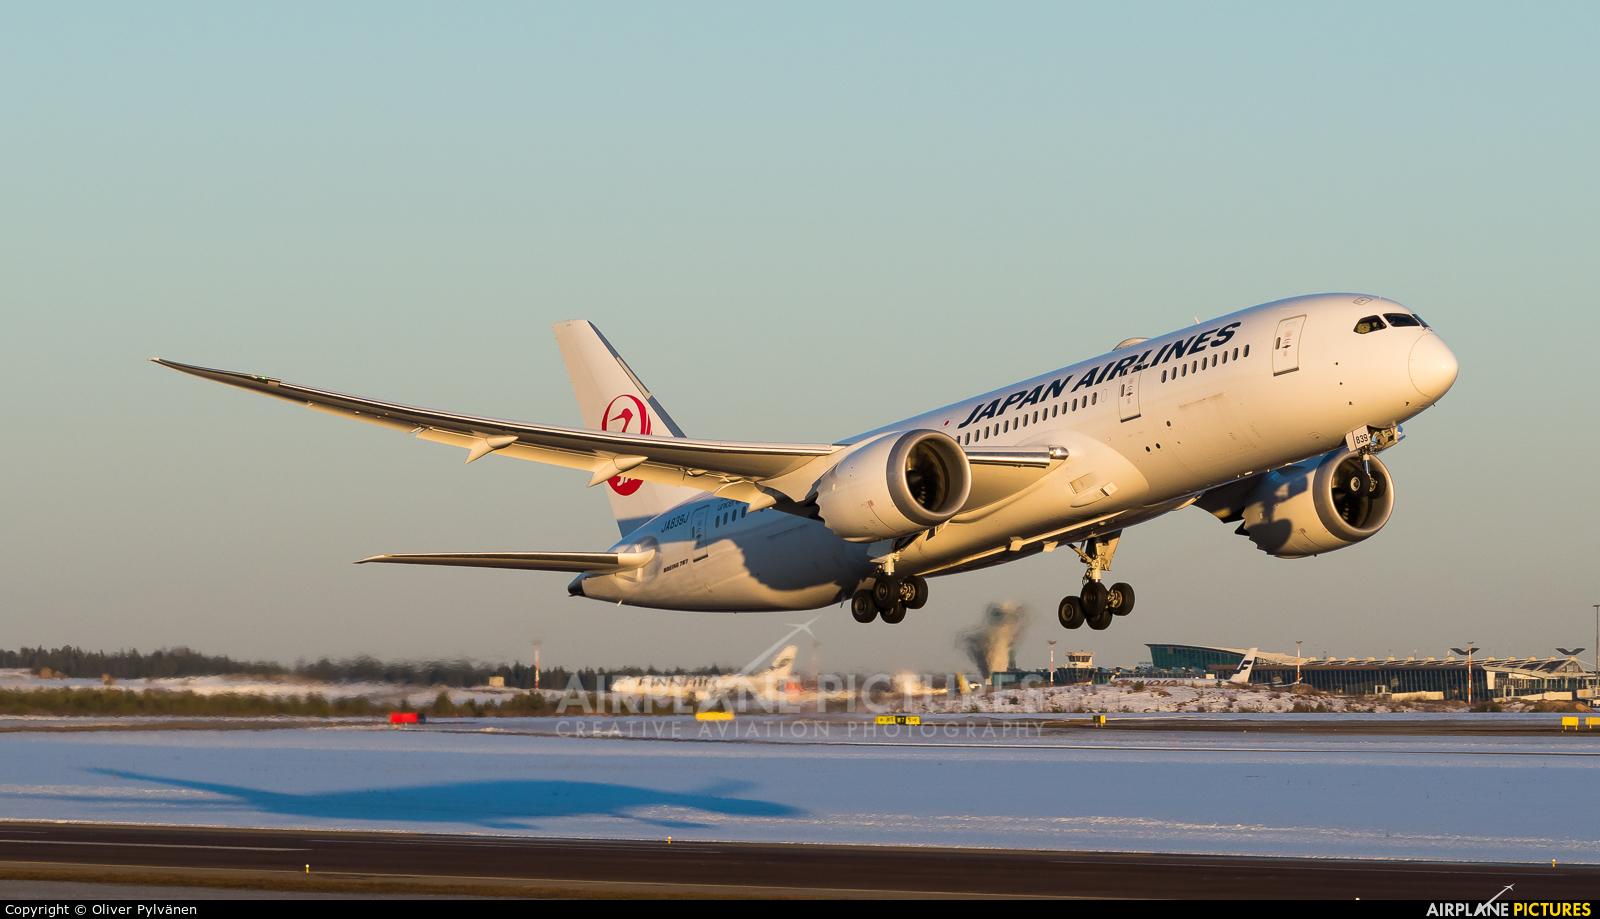 JAL - Japan Airlines JA839J aircraft at Helsinki - Vantaa